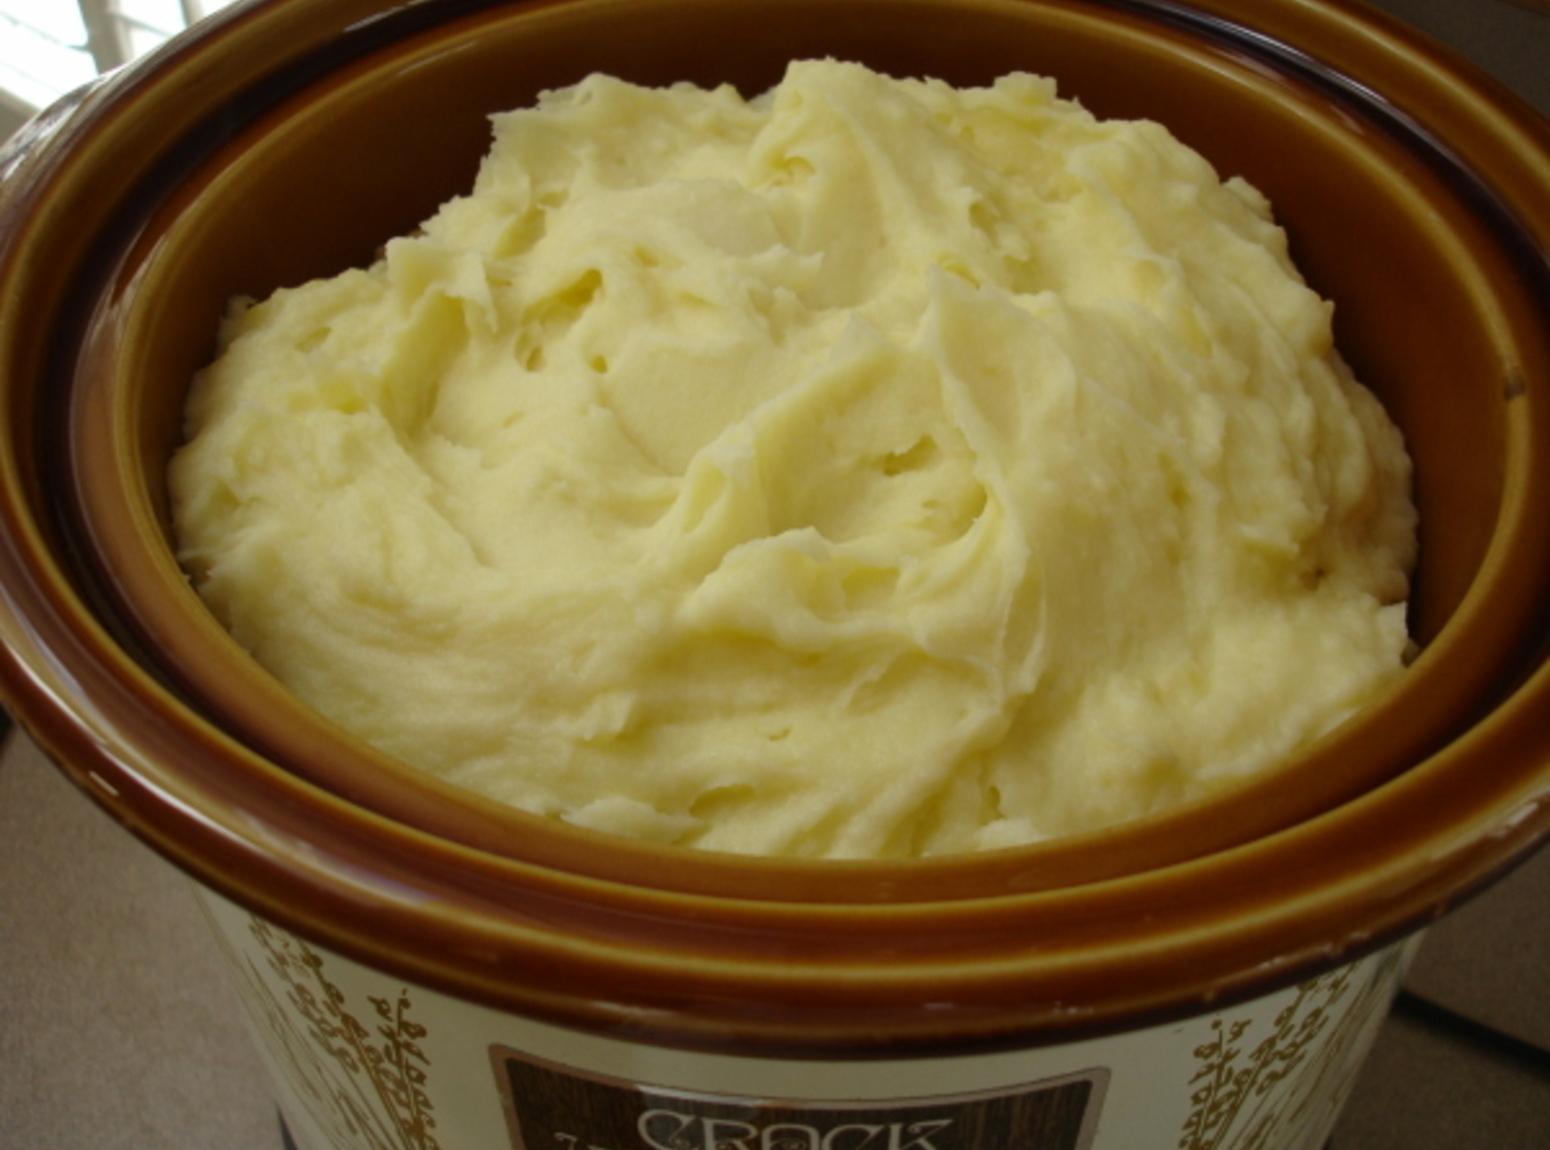 Making Mashed Potatoes Crock Pot